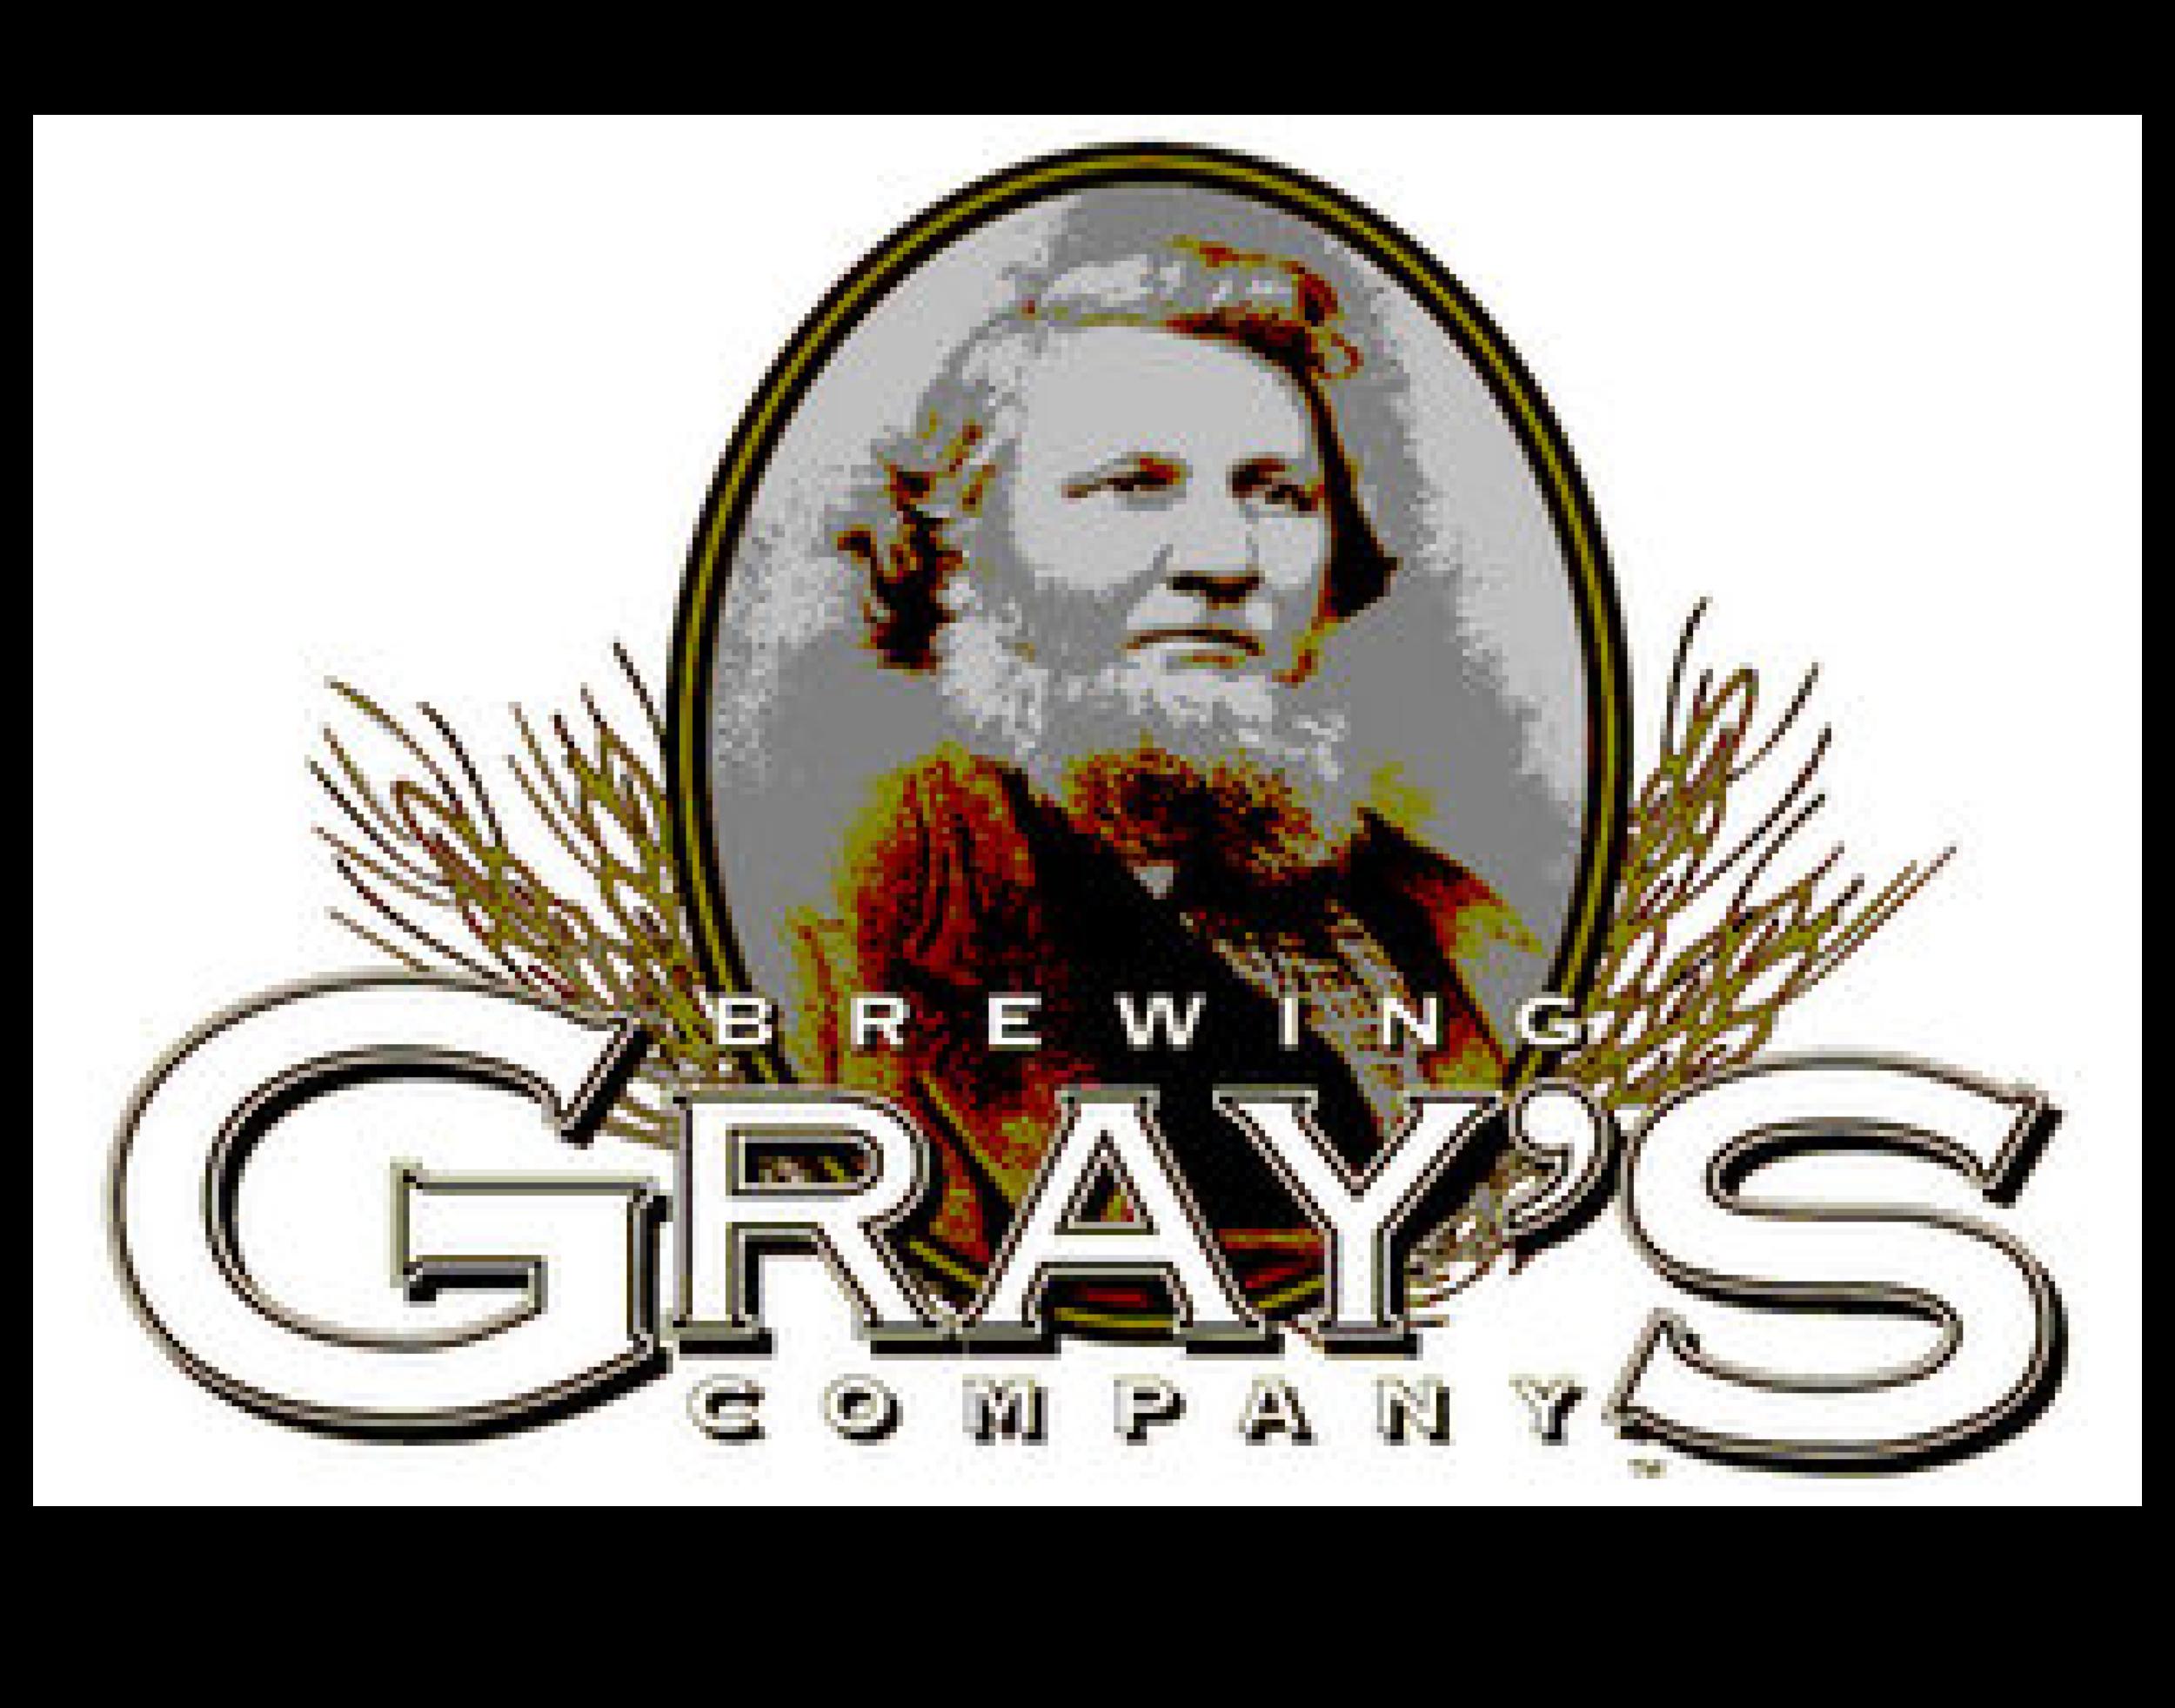 Gray's Brewing Company logo. Links to Gray's Brewing Company website.